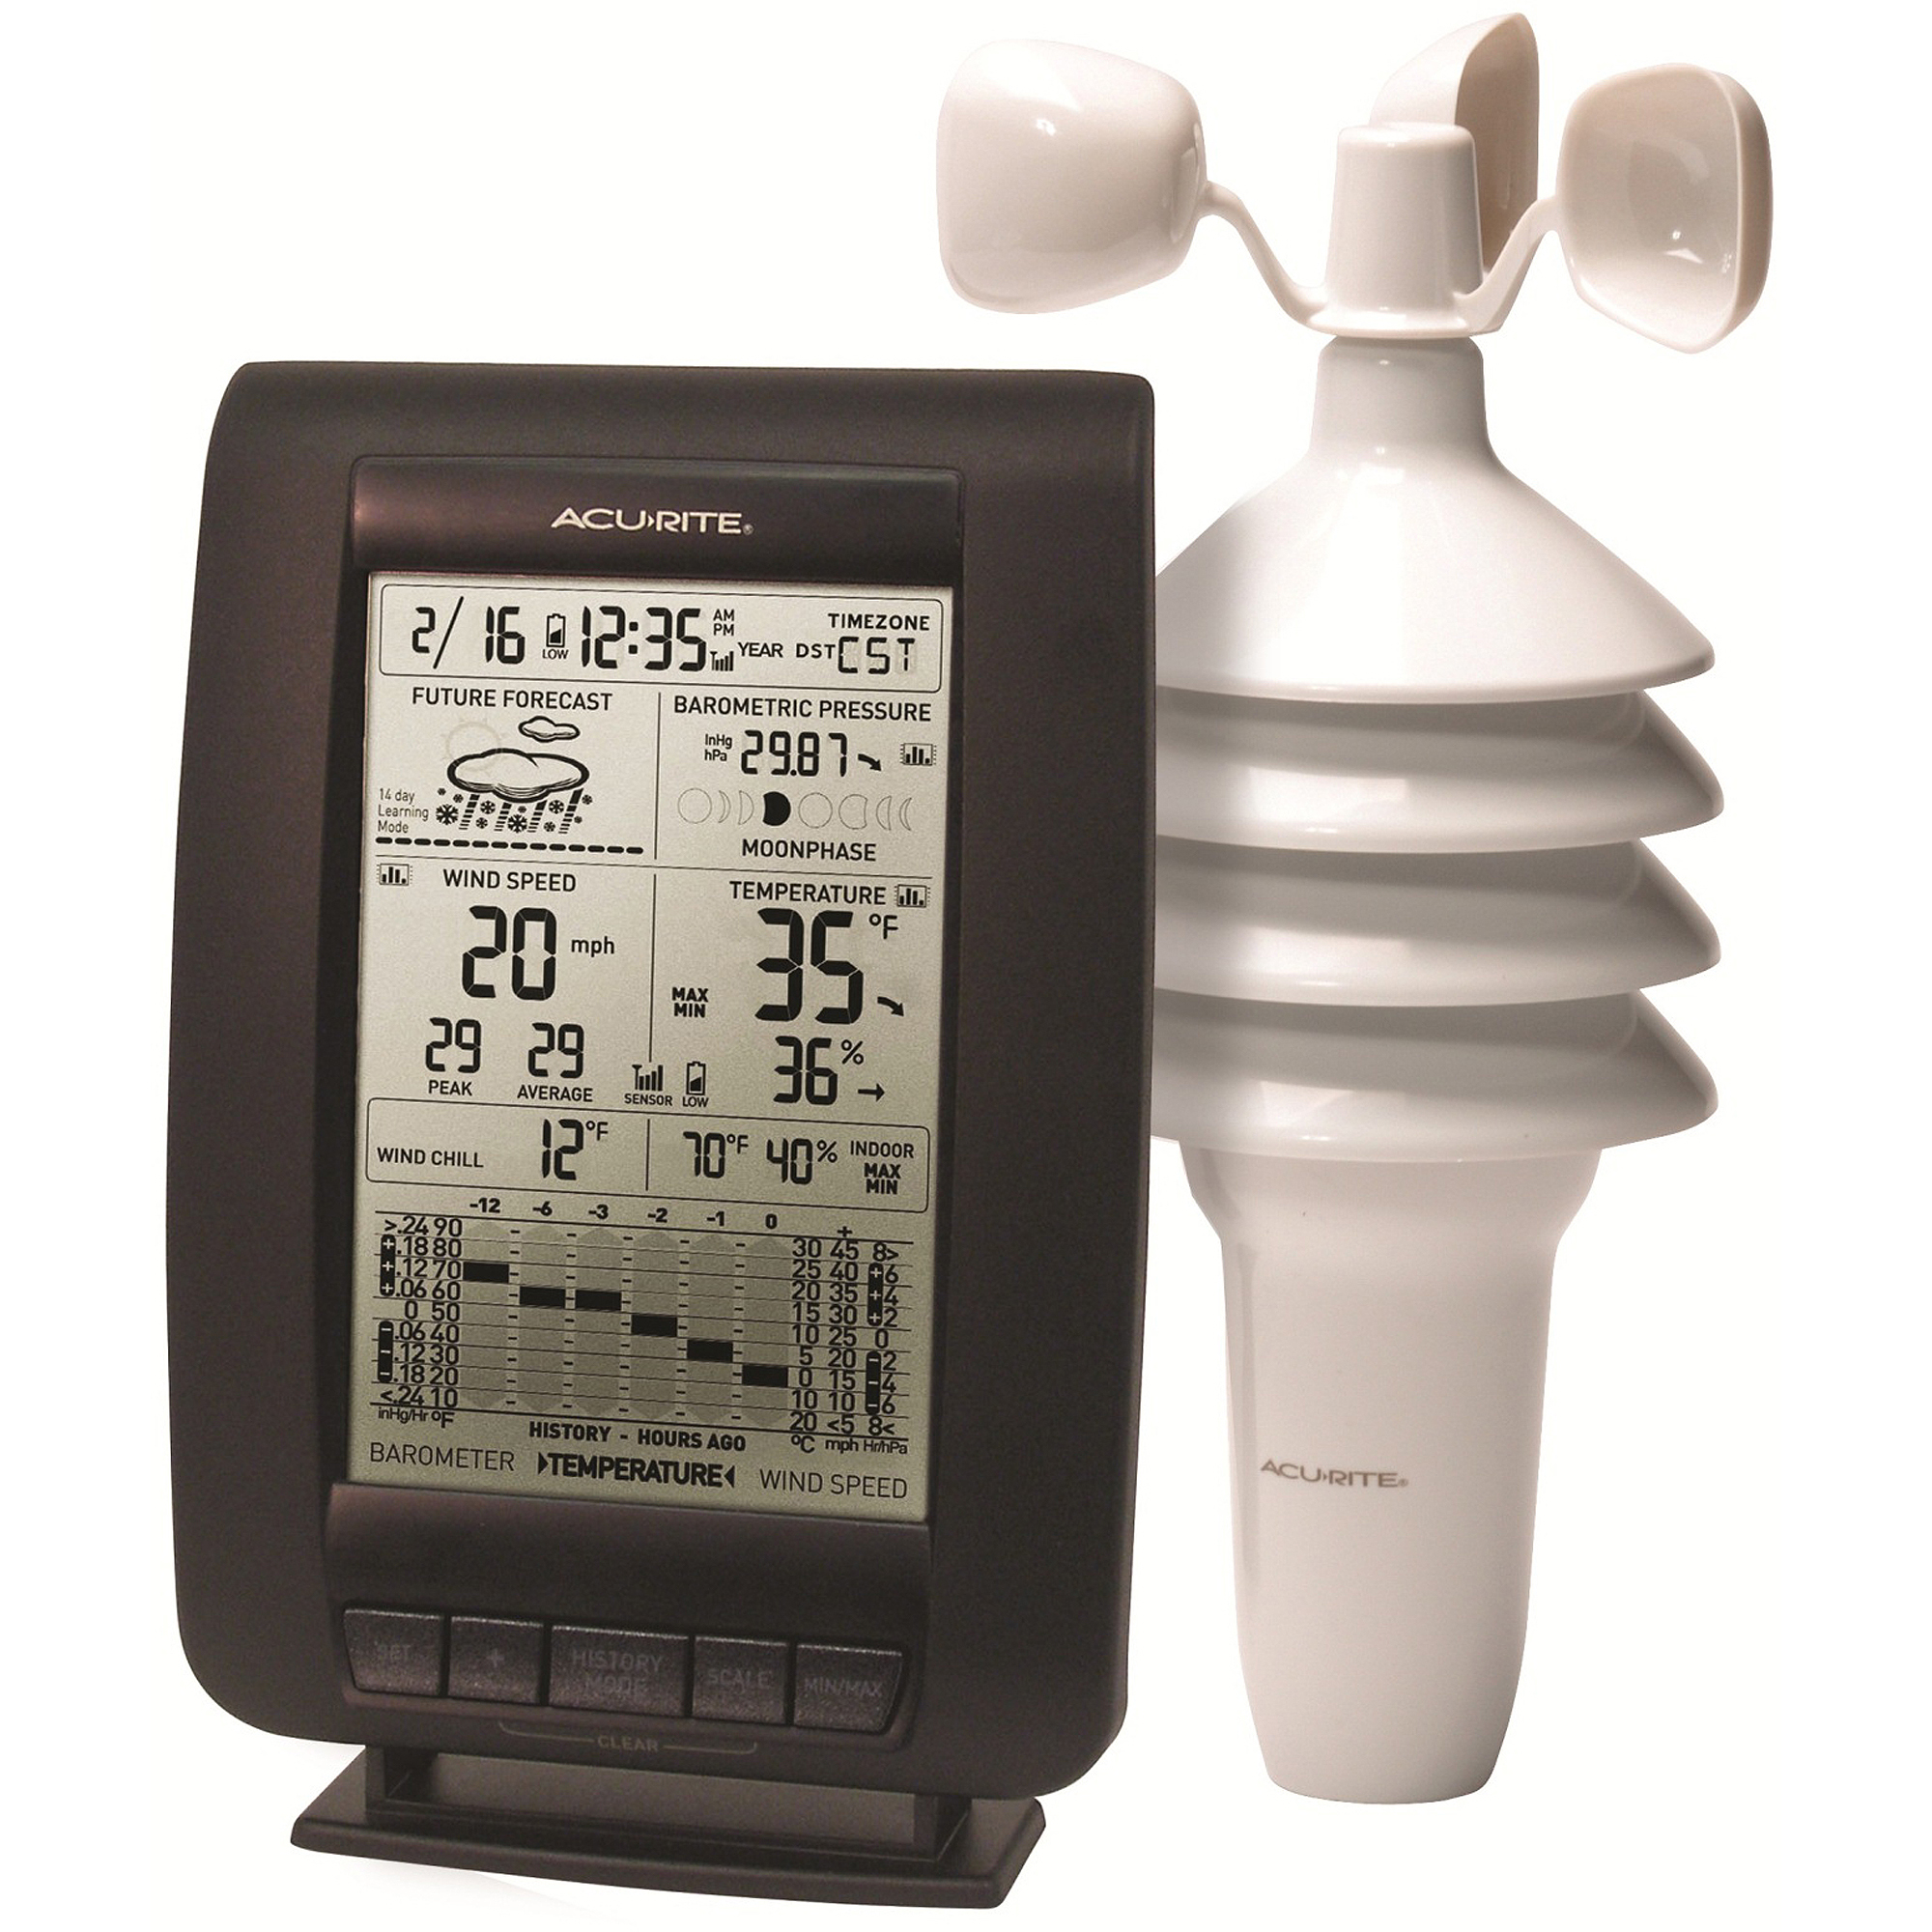 AcuRite Wireless 3-in-1 Digital Weather Center